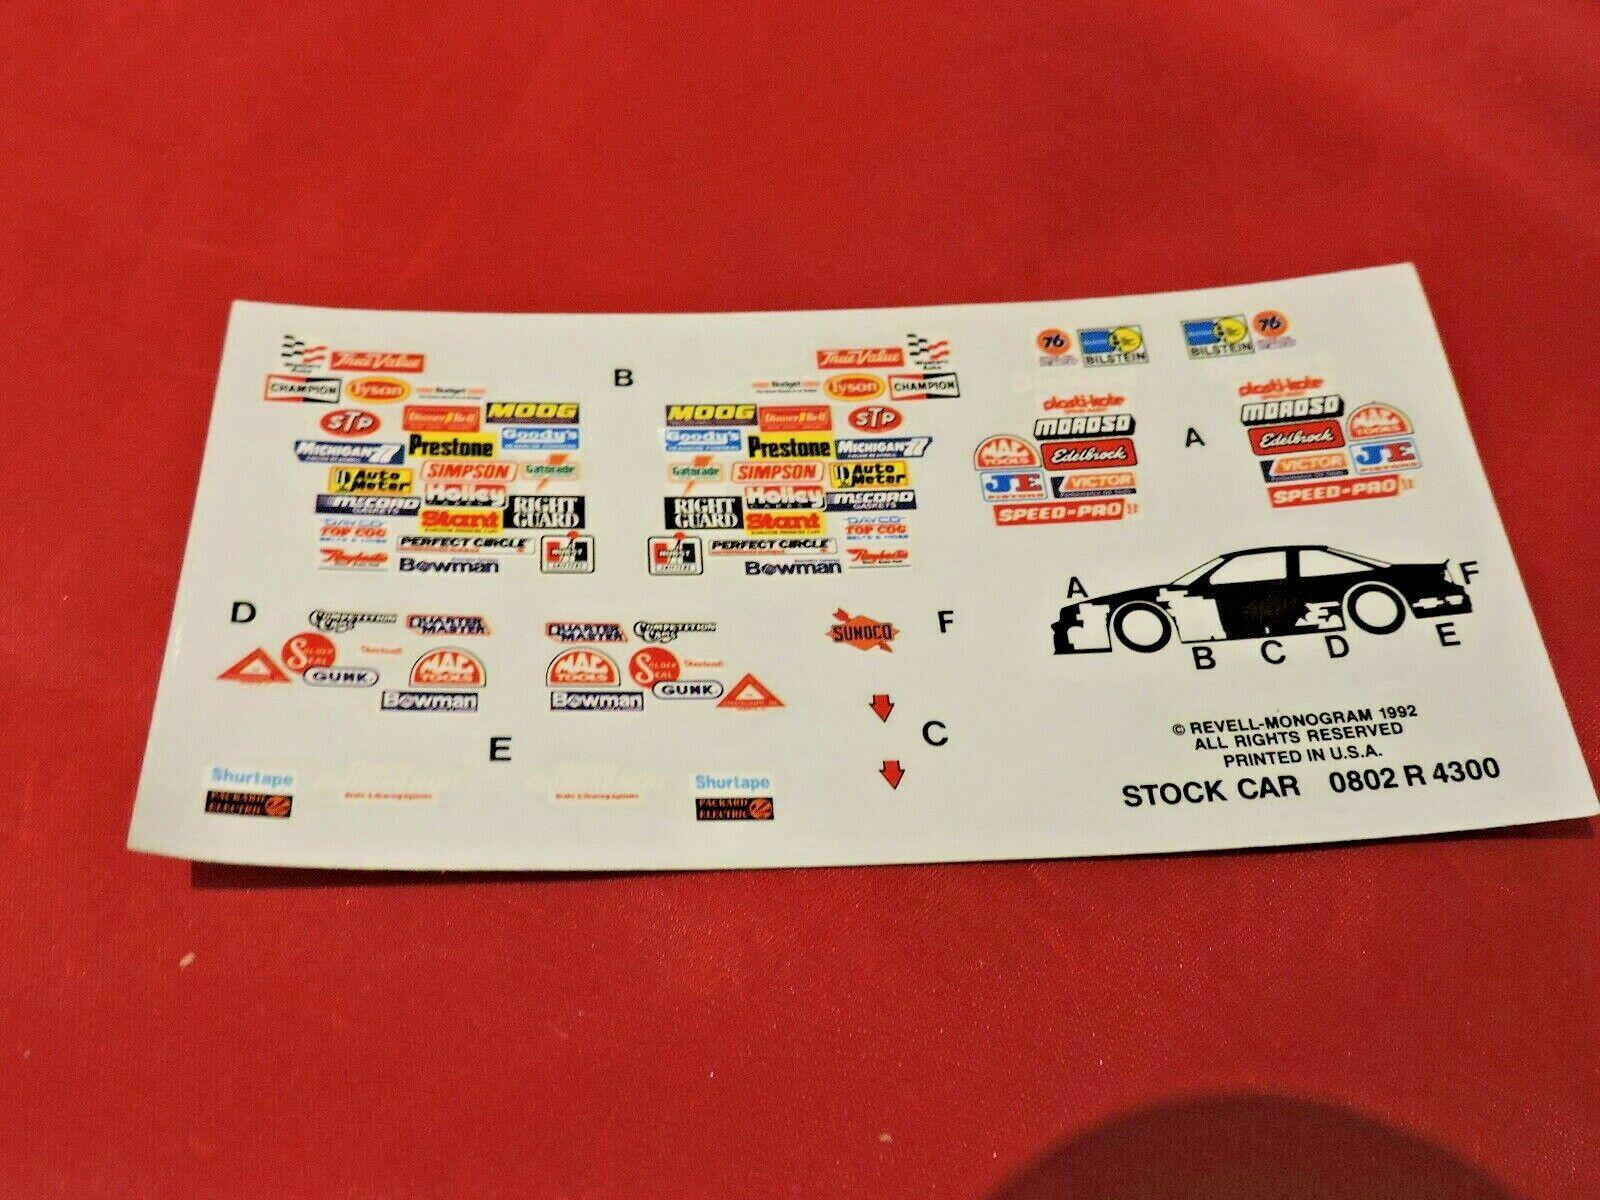 Car Parts - Model Car Parts Monogram Nascar Decal Sheet 1/24